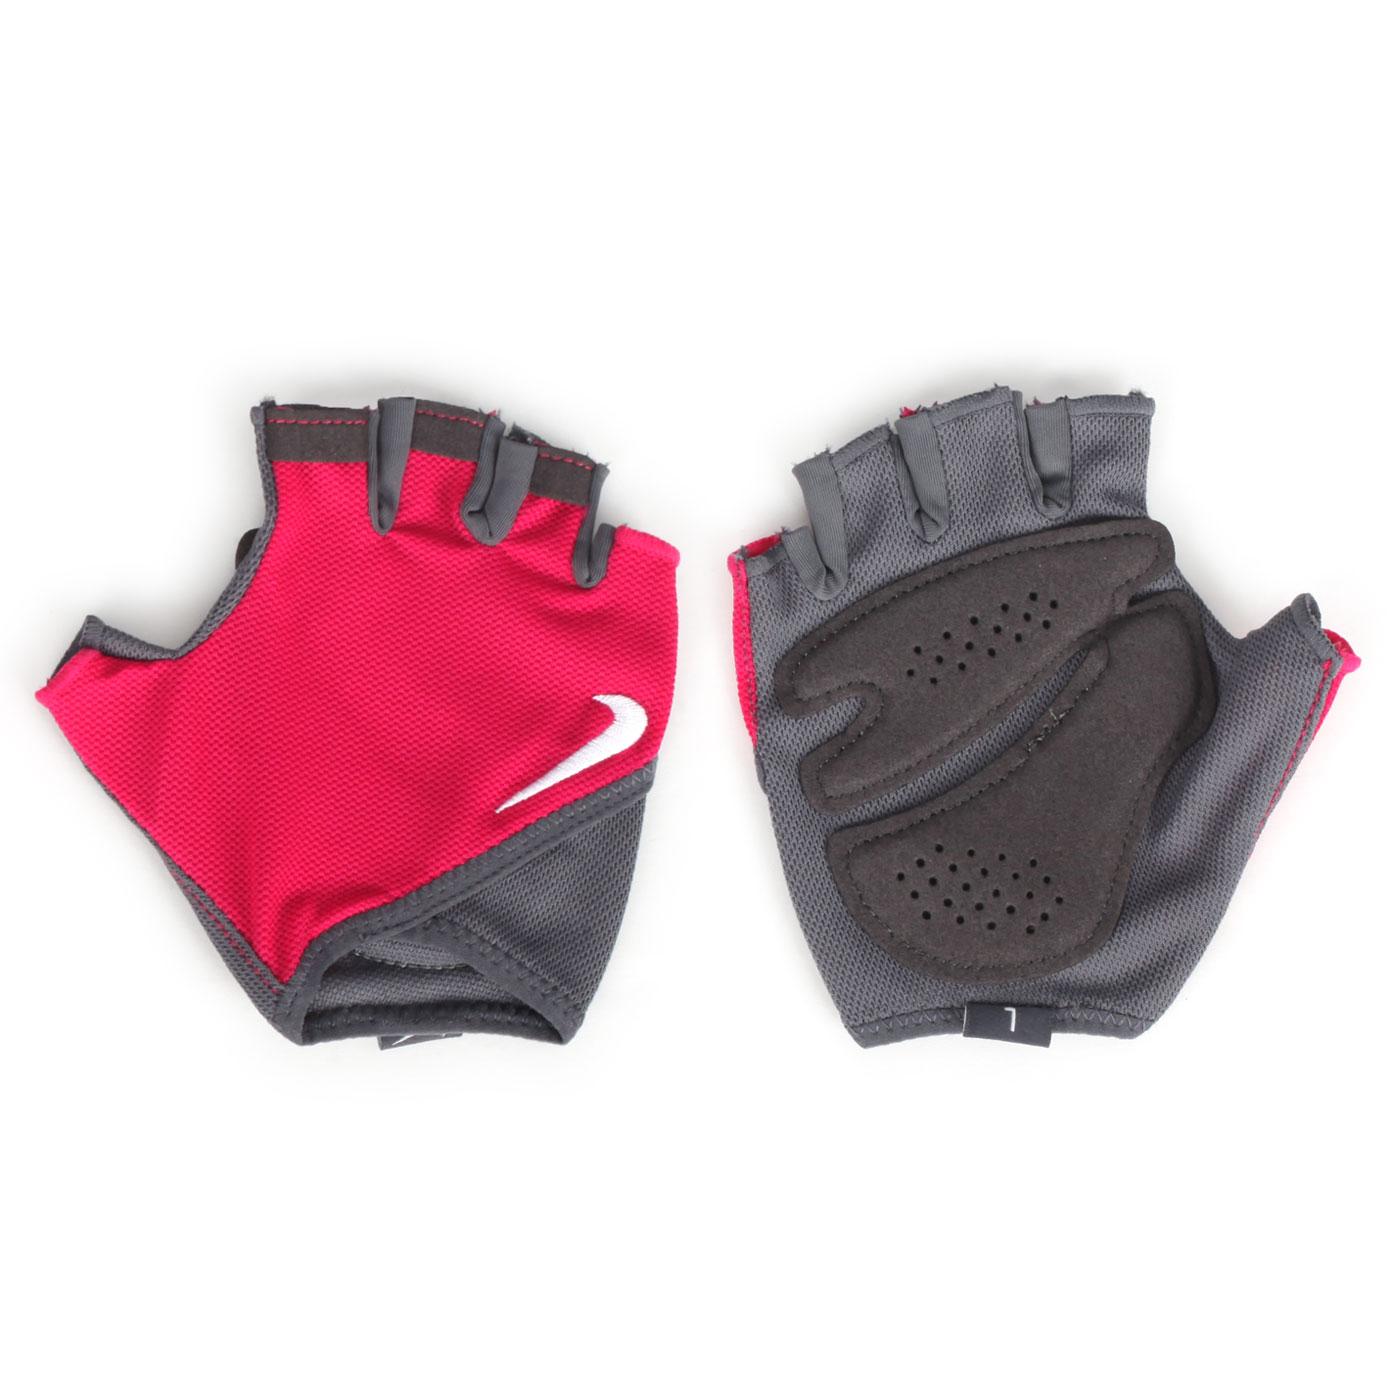 NIKE 女款基礎訓練手套 N0002557010LG - 桃紅灰白